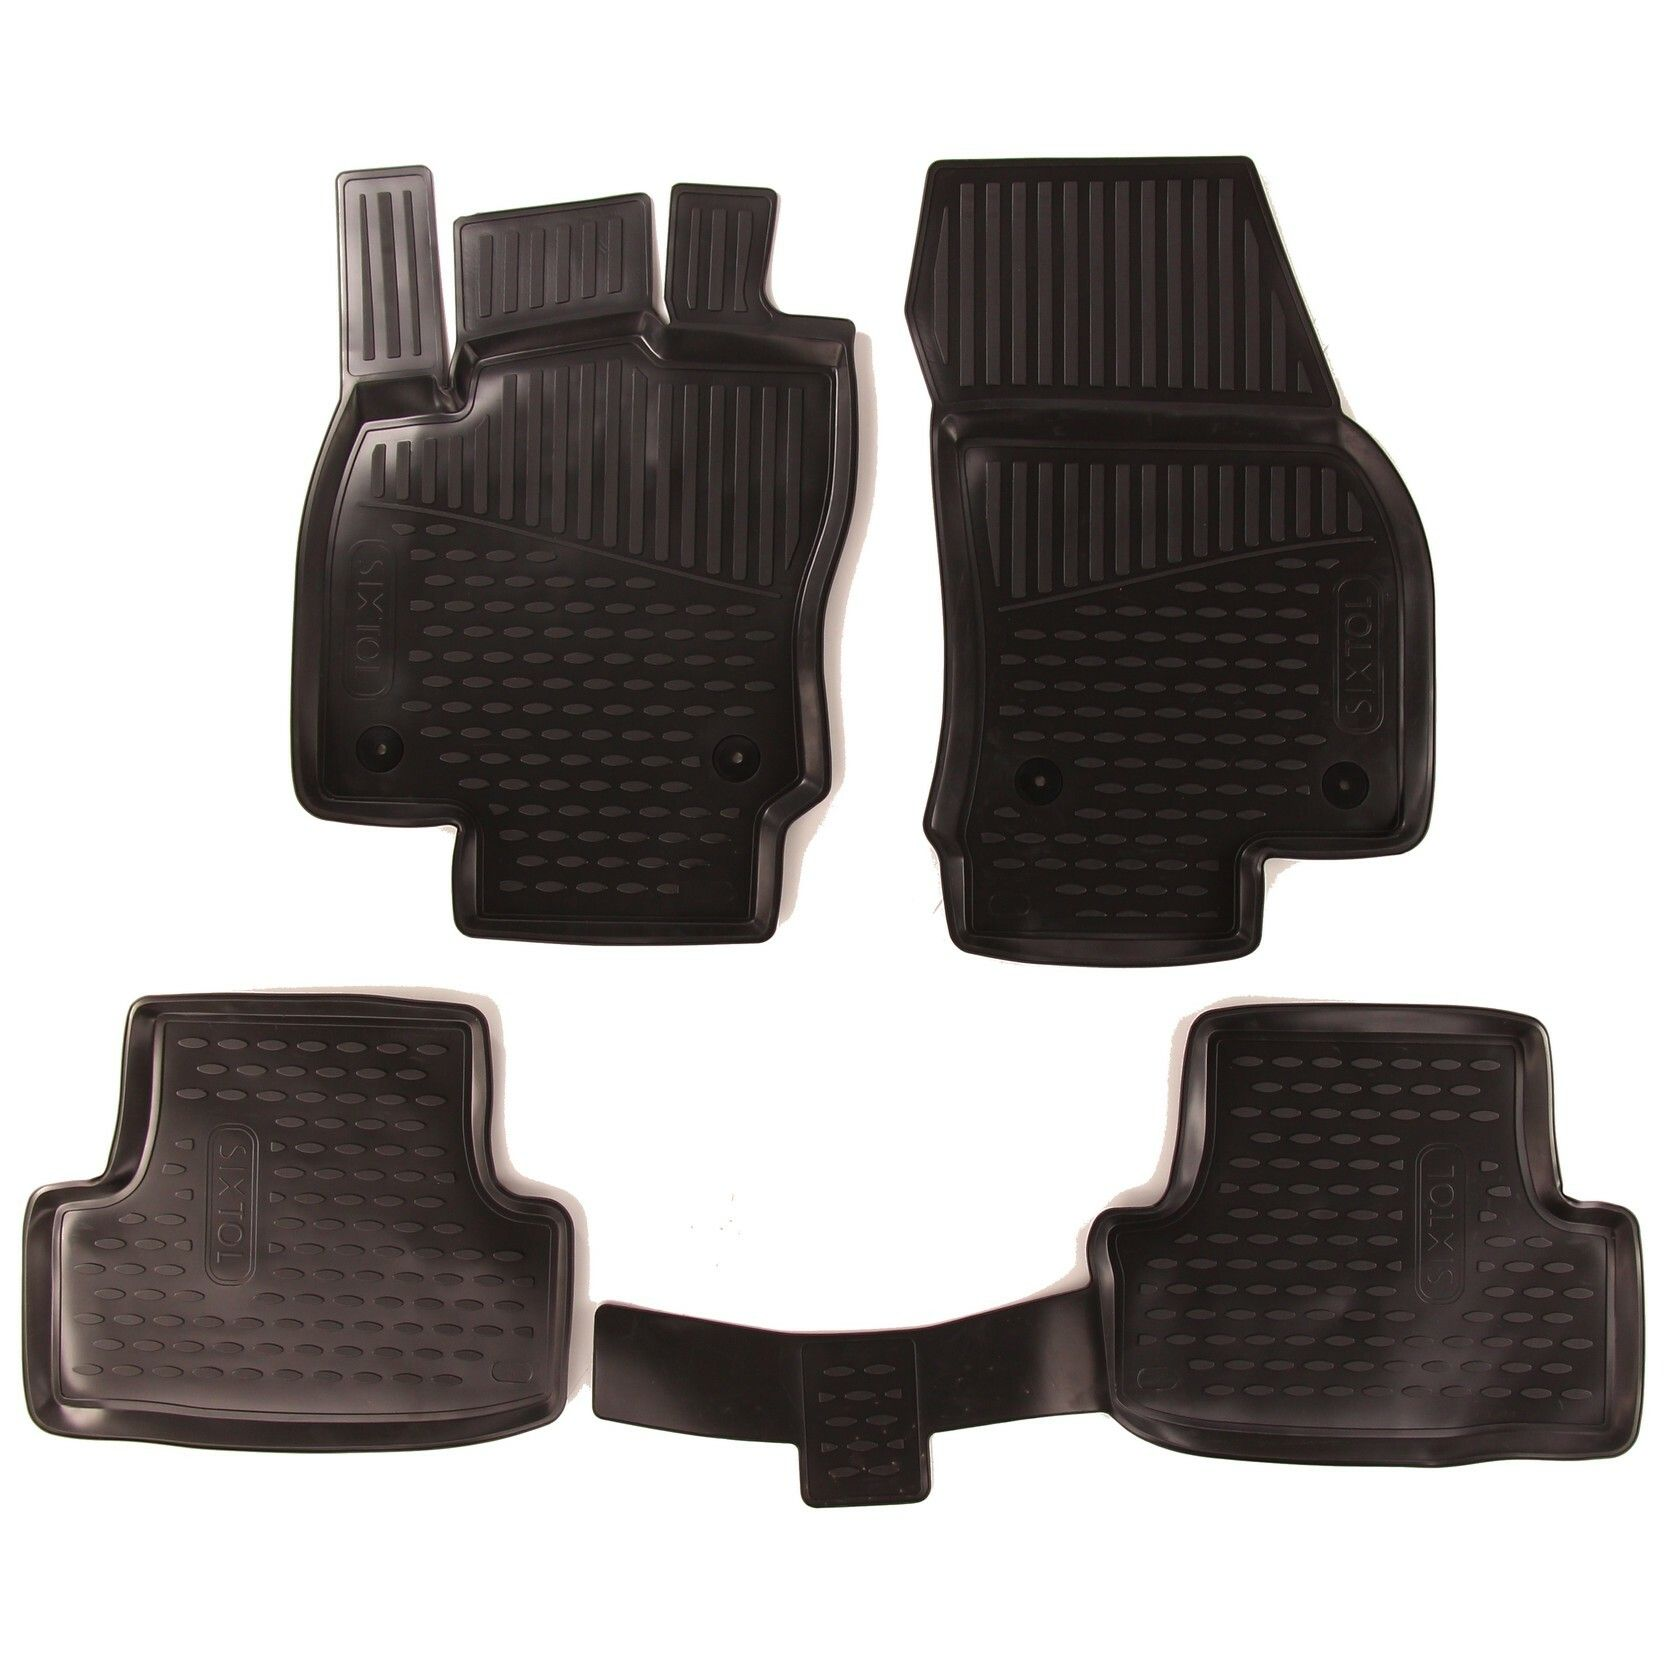 Gumové koberce SEAT Ateca, 2016->, Compact SUV, Evropa